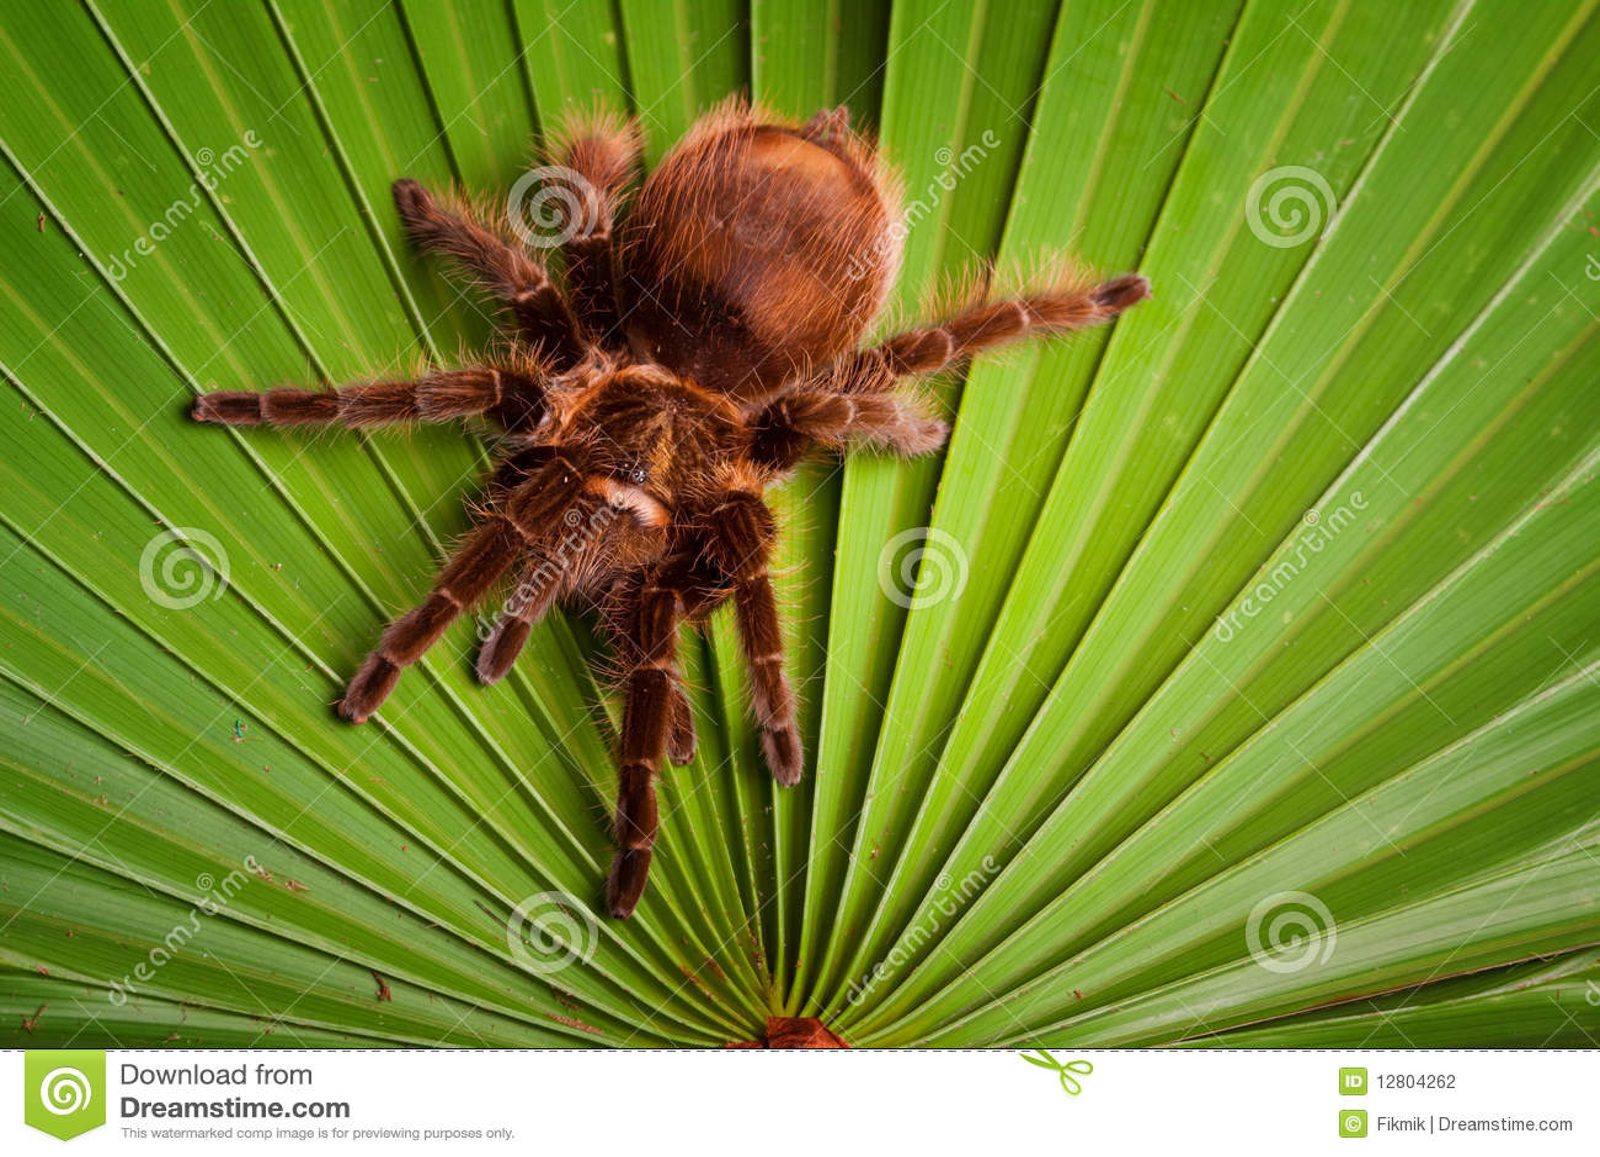 Aranha de Gigant na folha